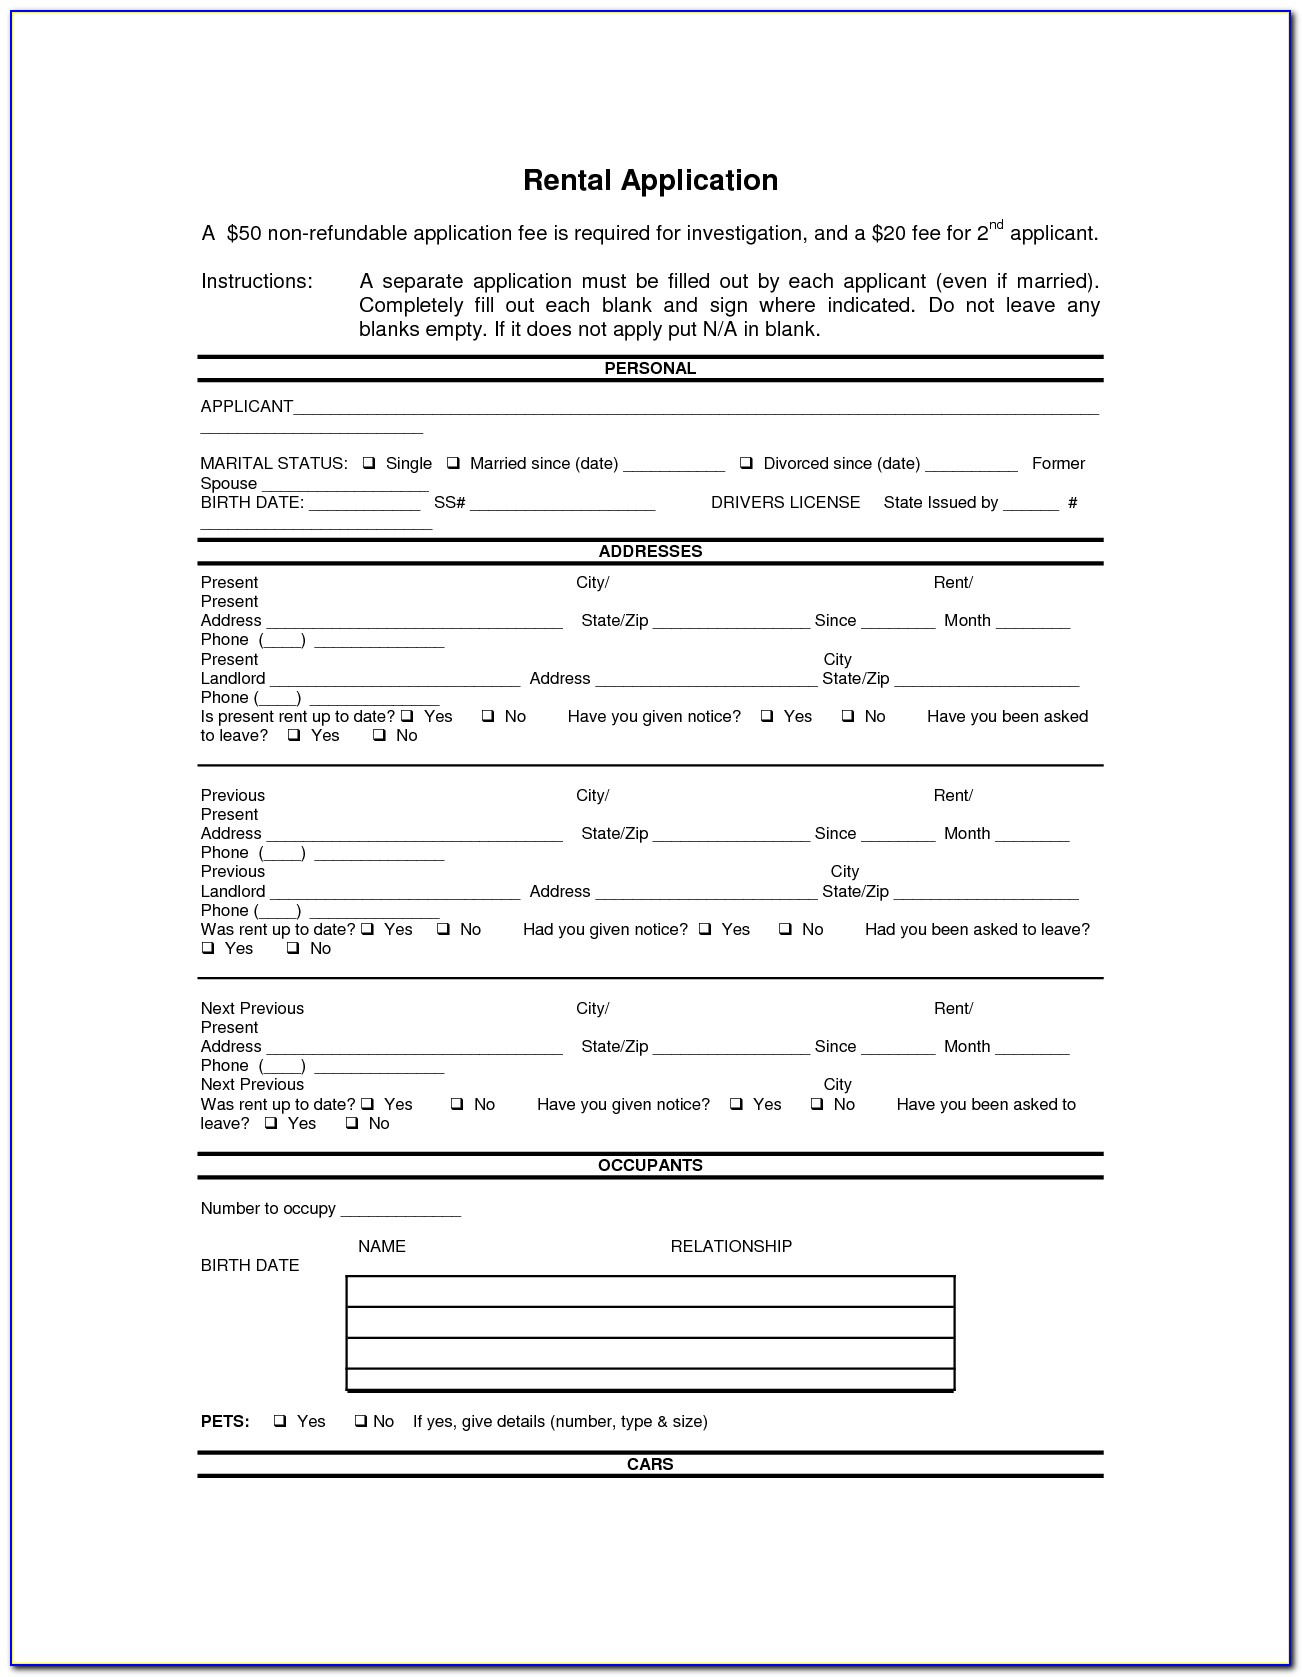 Doc.#592799: Printable Rental Agreement Forms – Free Rental Forms With Free Printable Rental Application